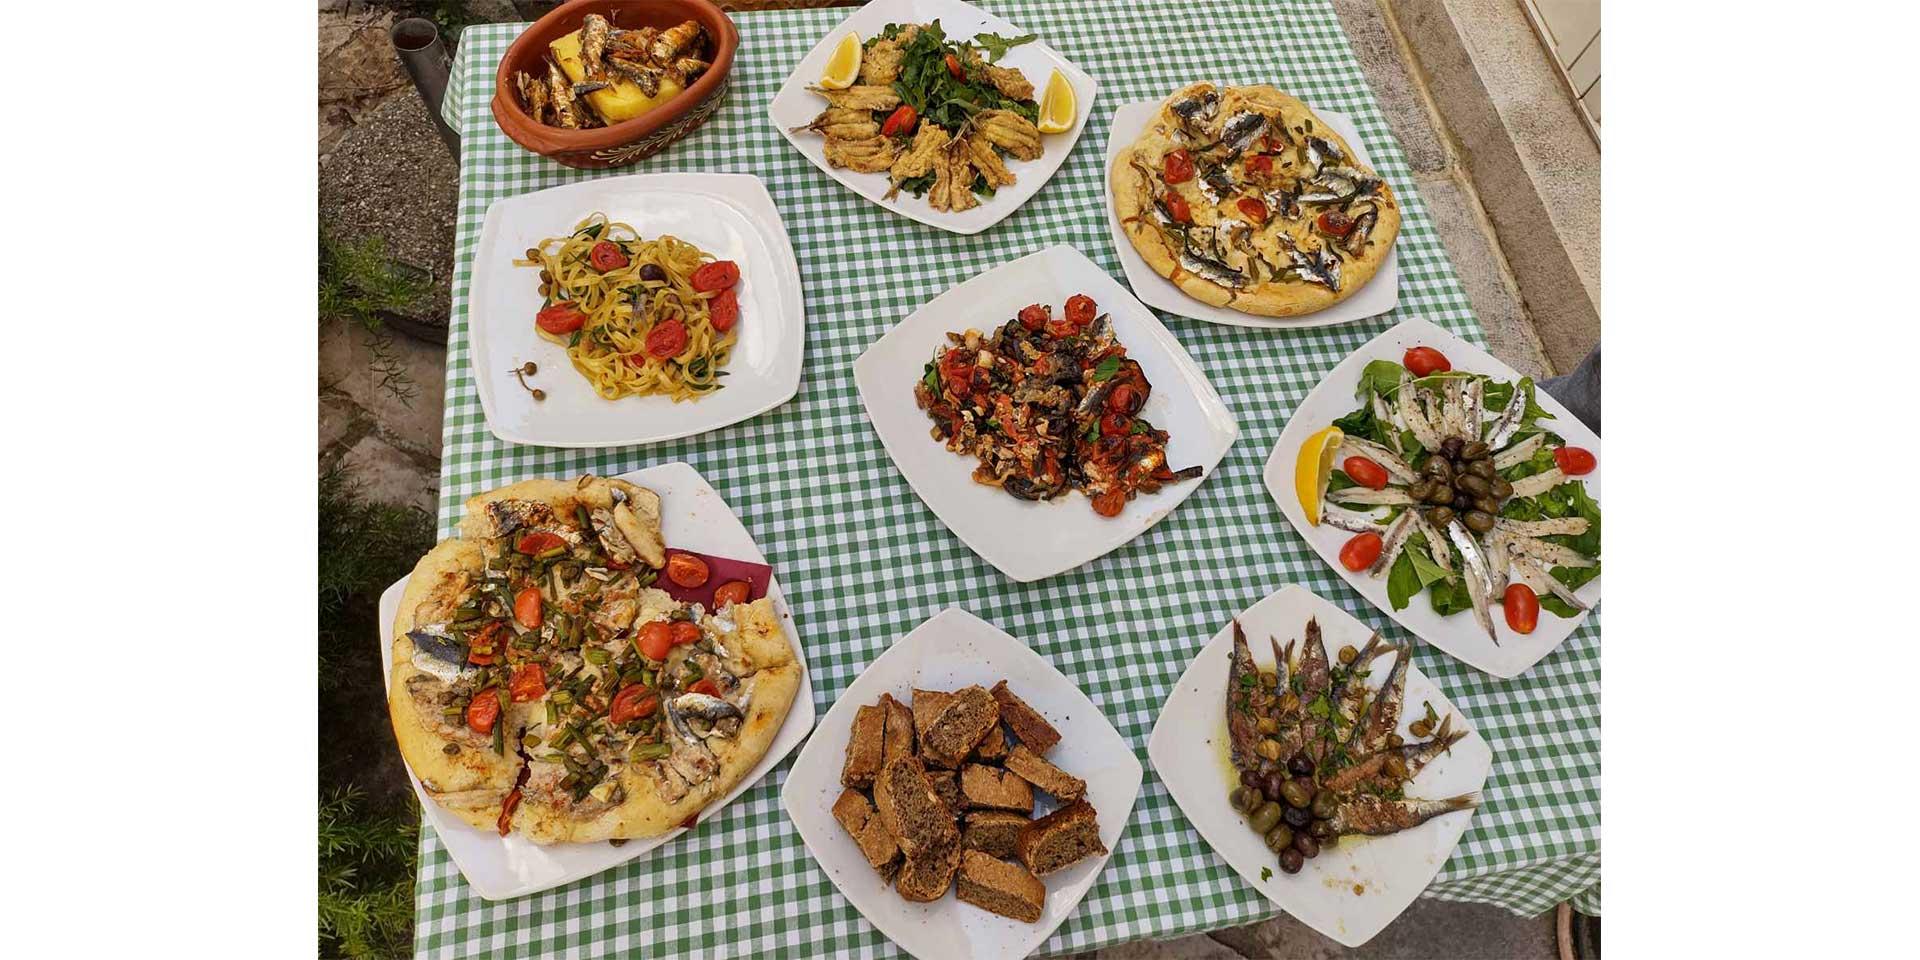 budva-restaurants budva-registration-fee adriatic-sea budva-events budva-weather